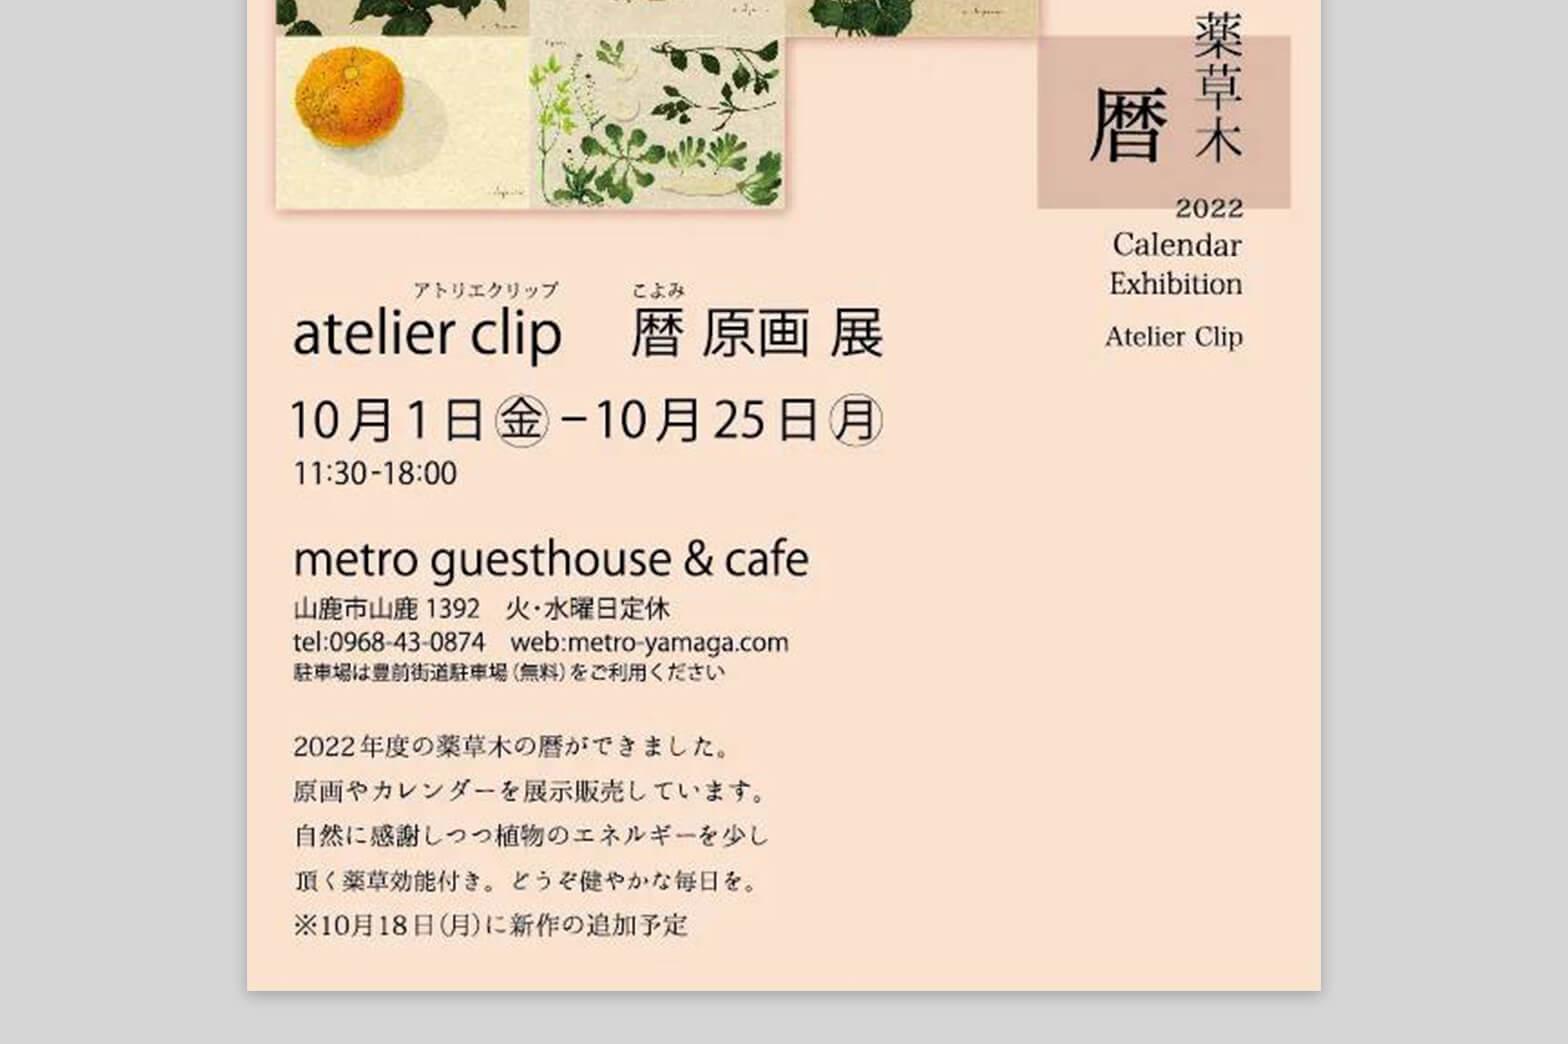 atelier clip 暦 原画展